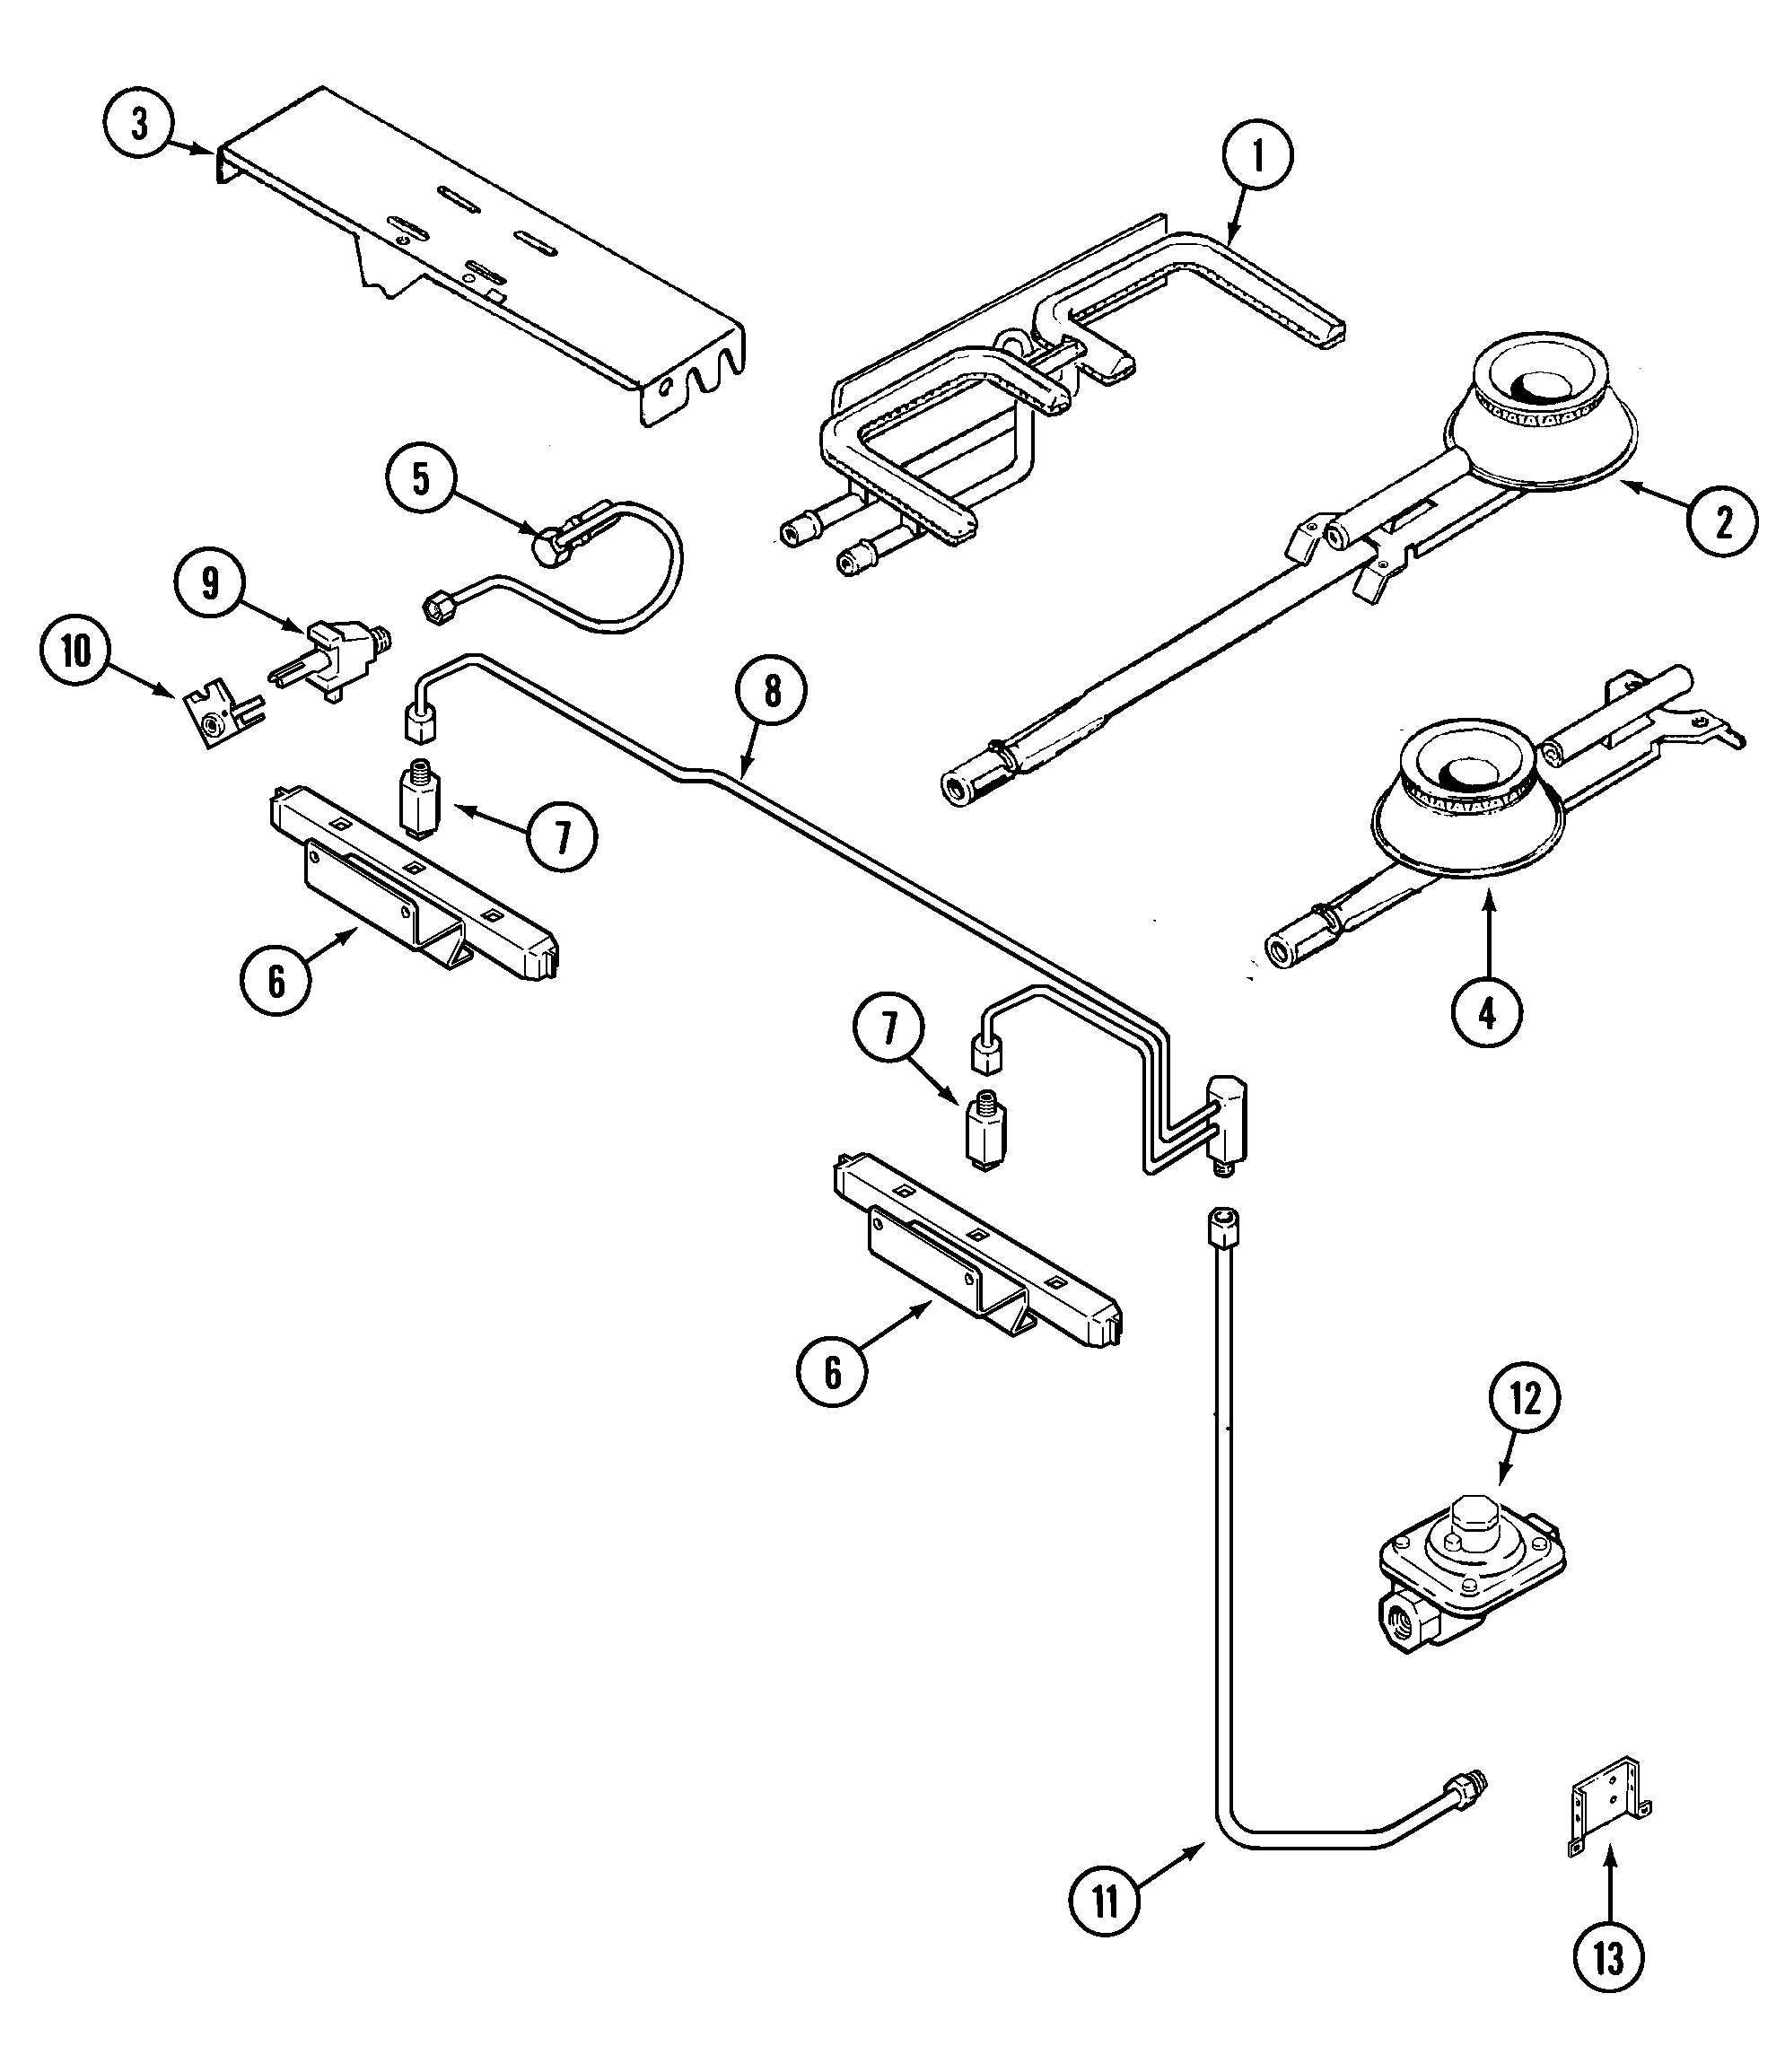 gas grill wiring diagram